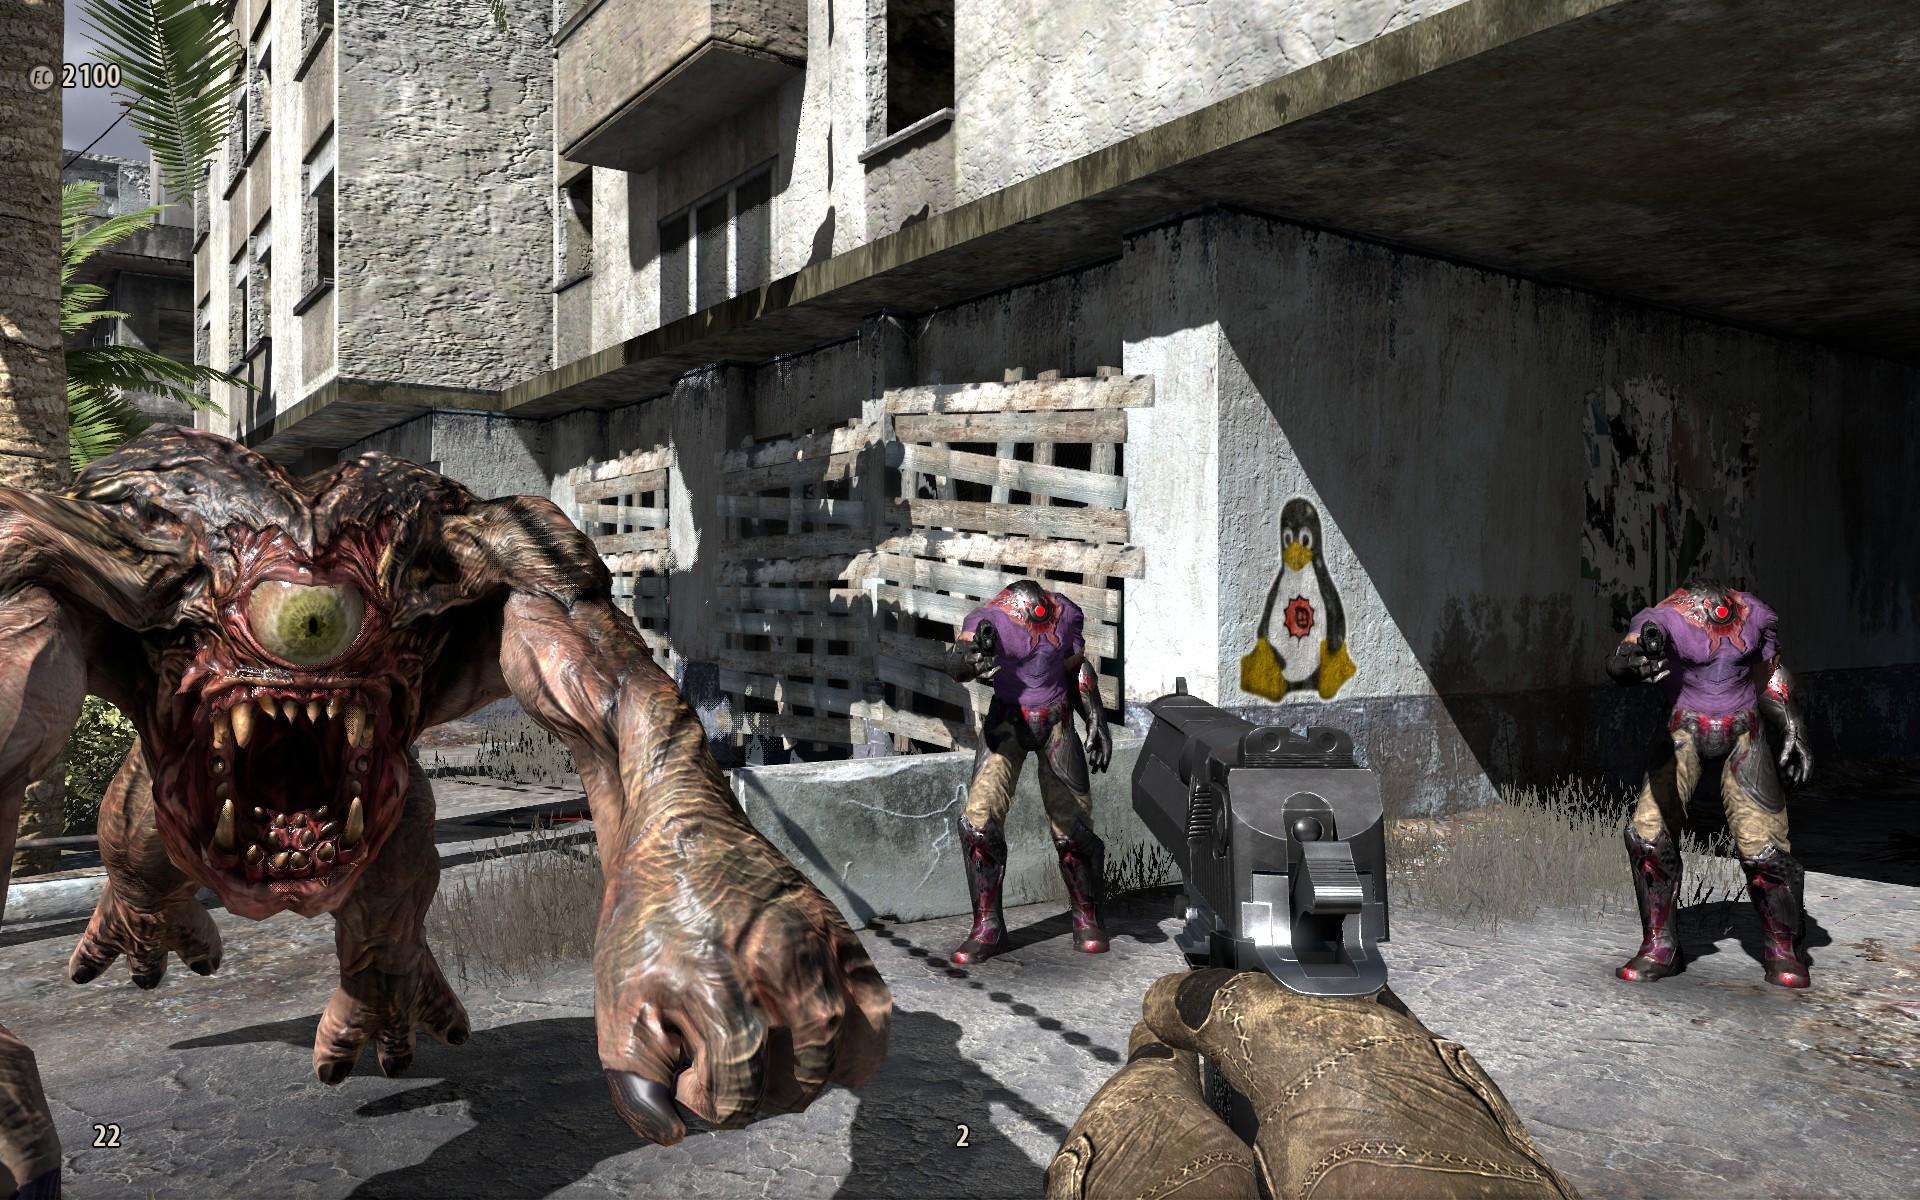 Risultati immagini per Serious Sam 3: BFE (PS3)